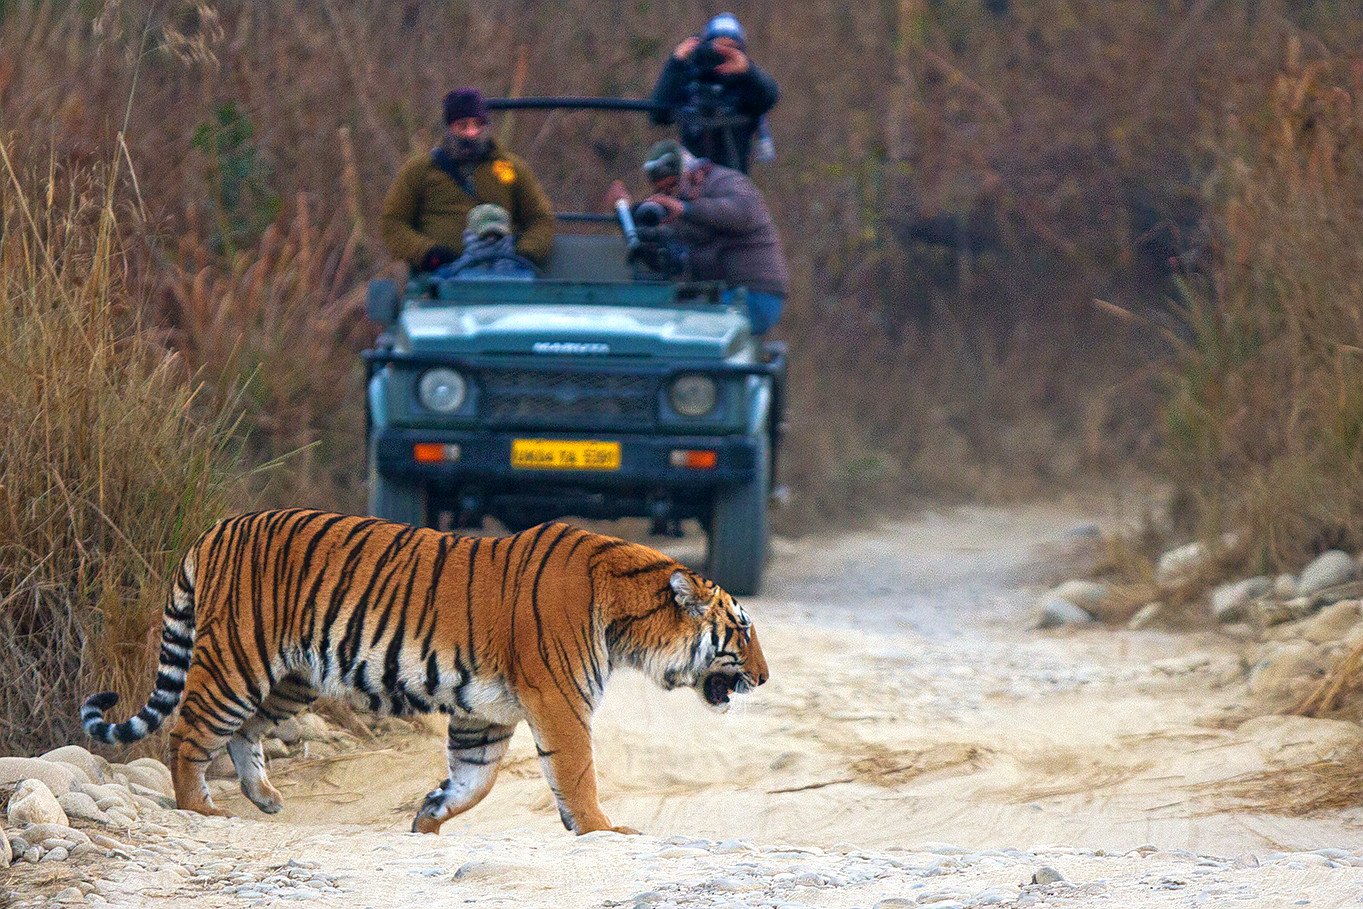 1596628133_filming_of_bengal_tiger_in_jim_corbett_national_park.png